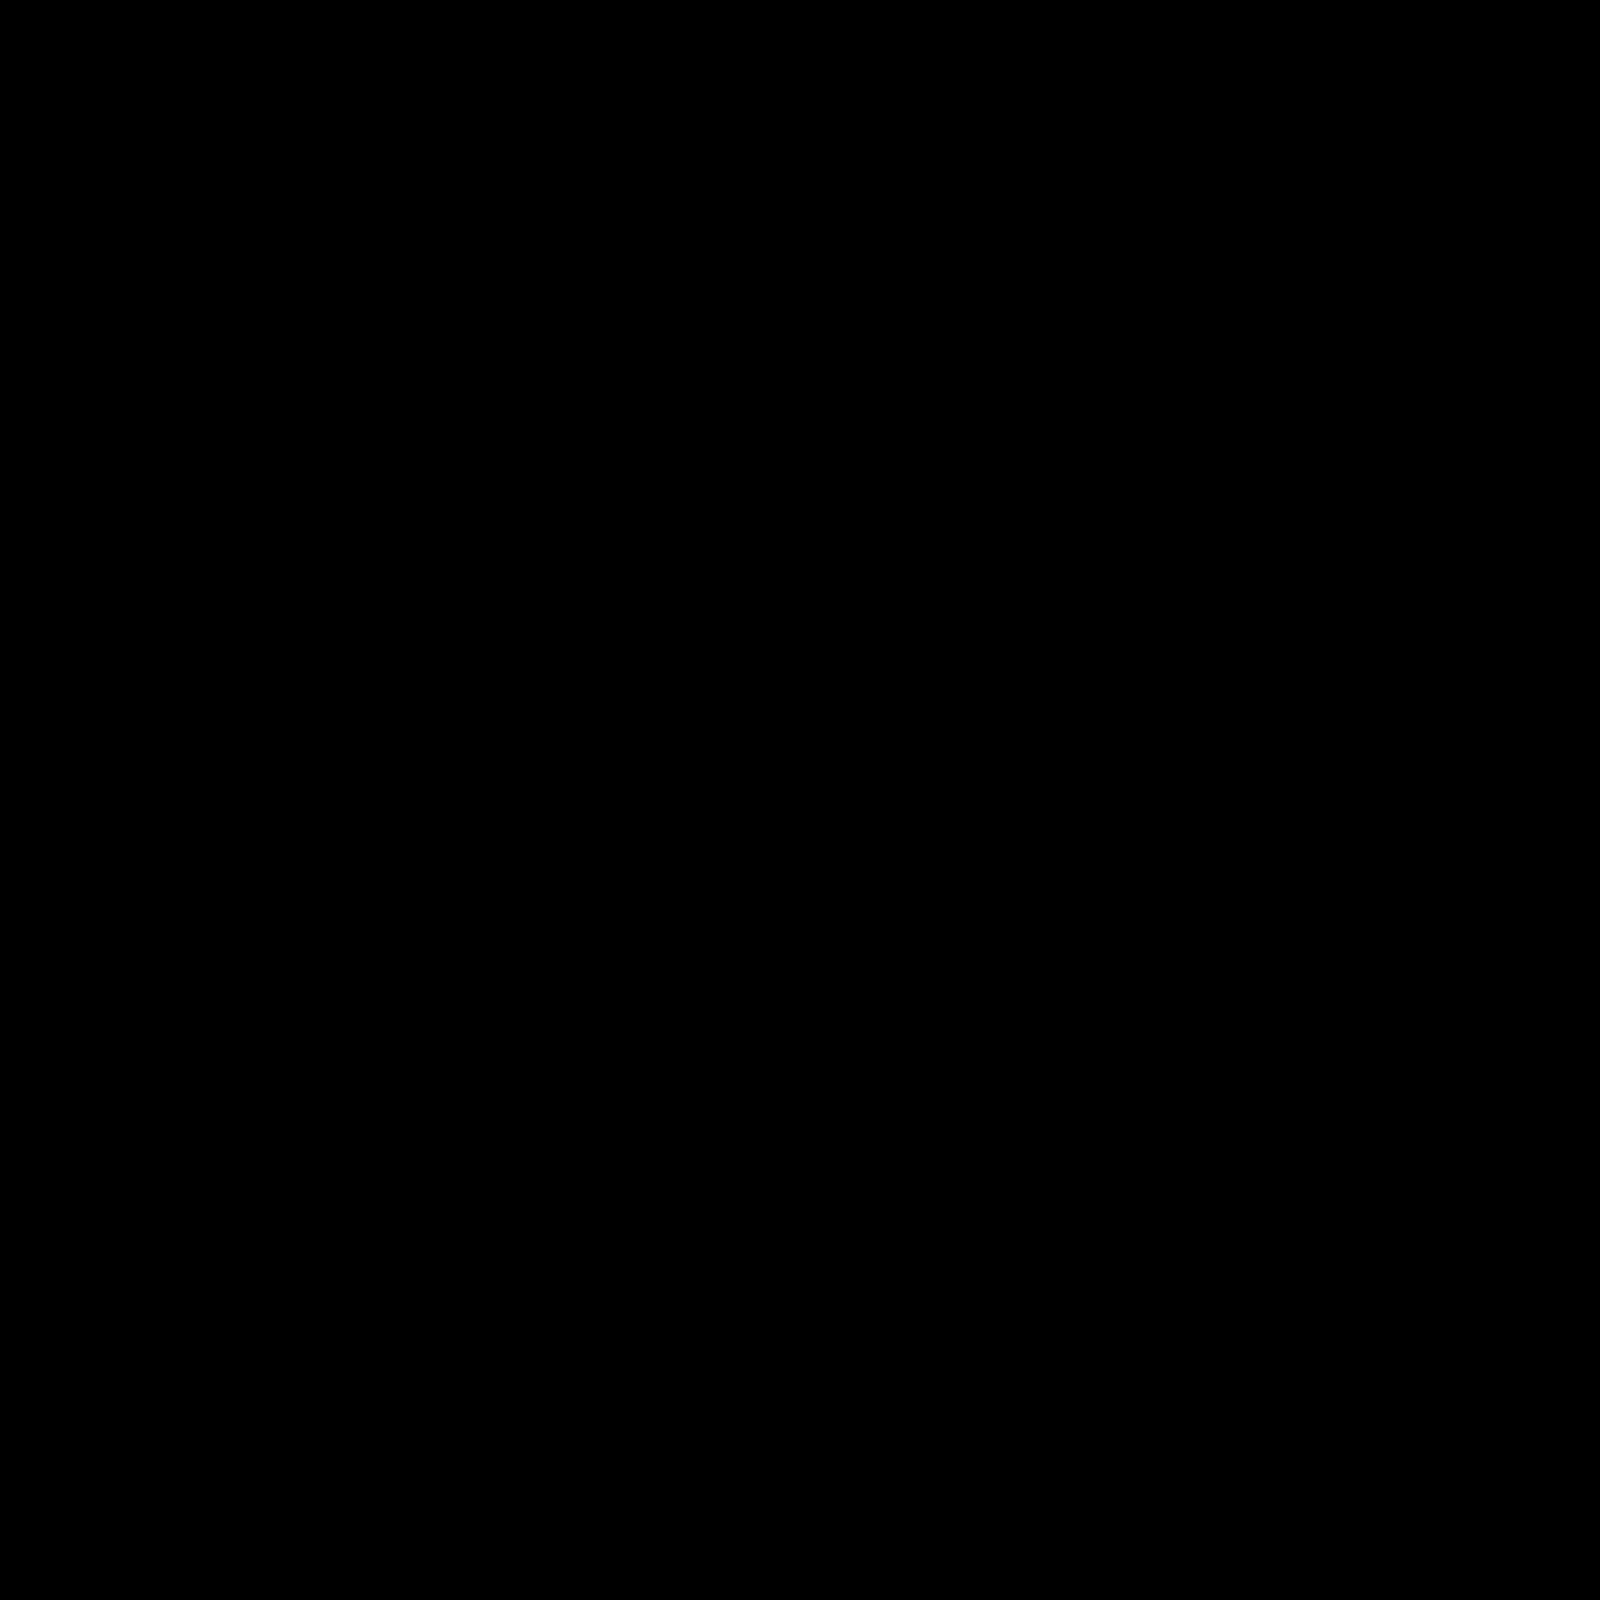 Nowy plik icon